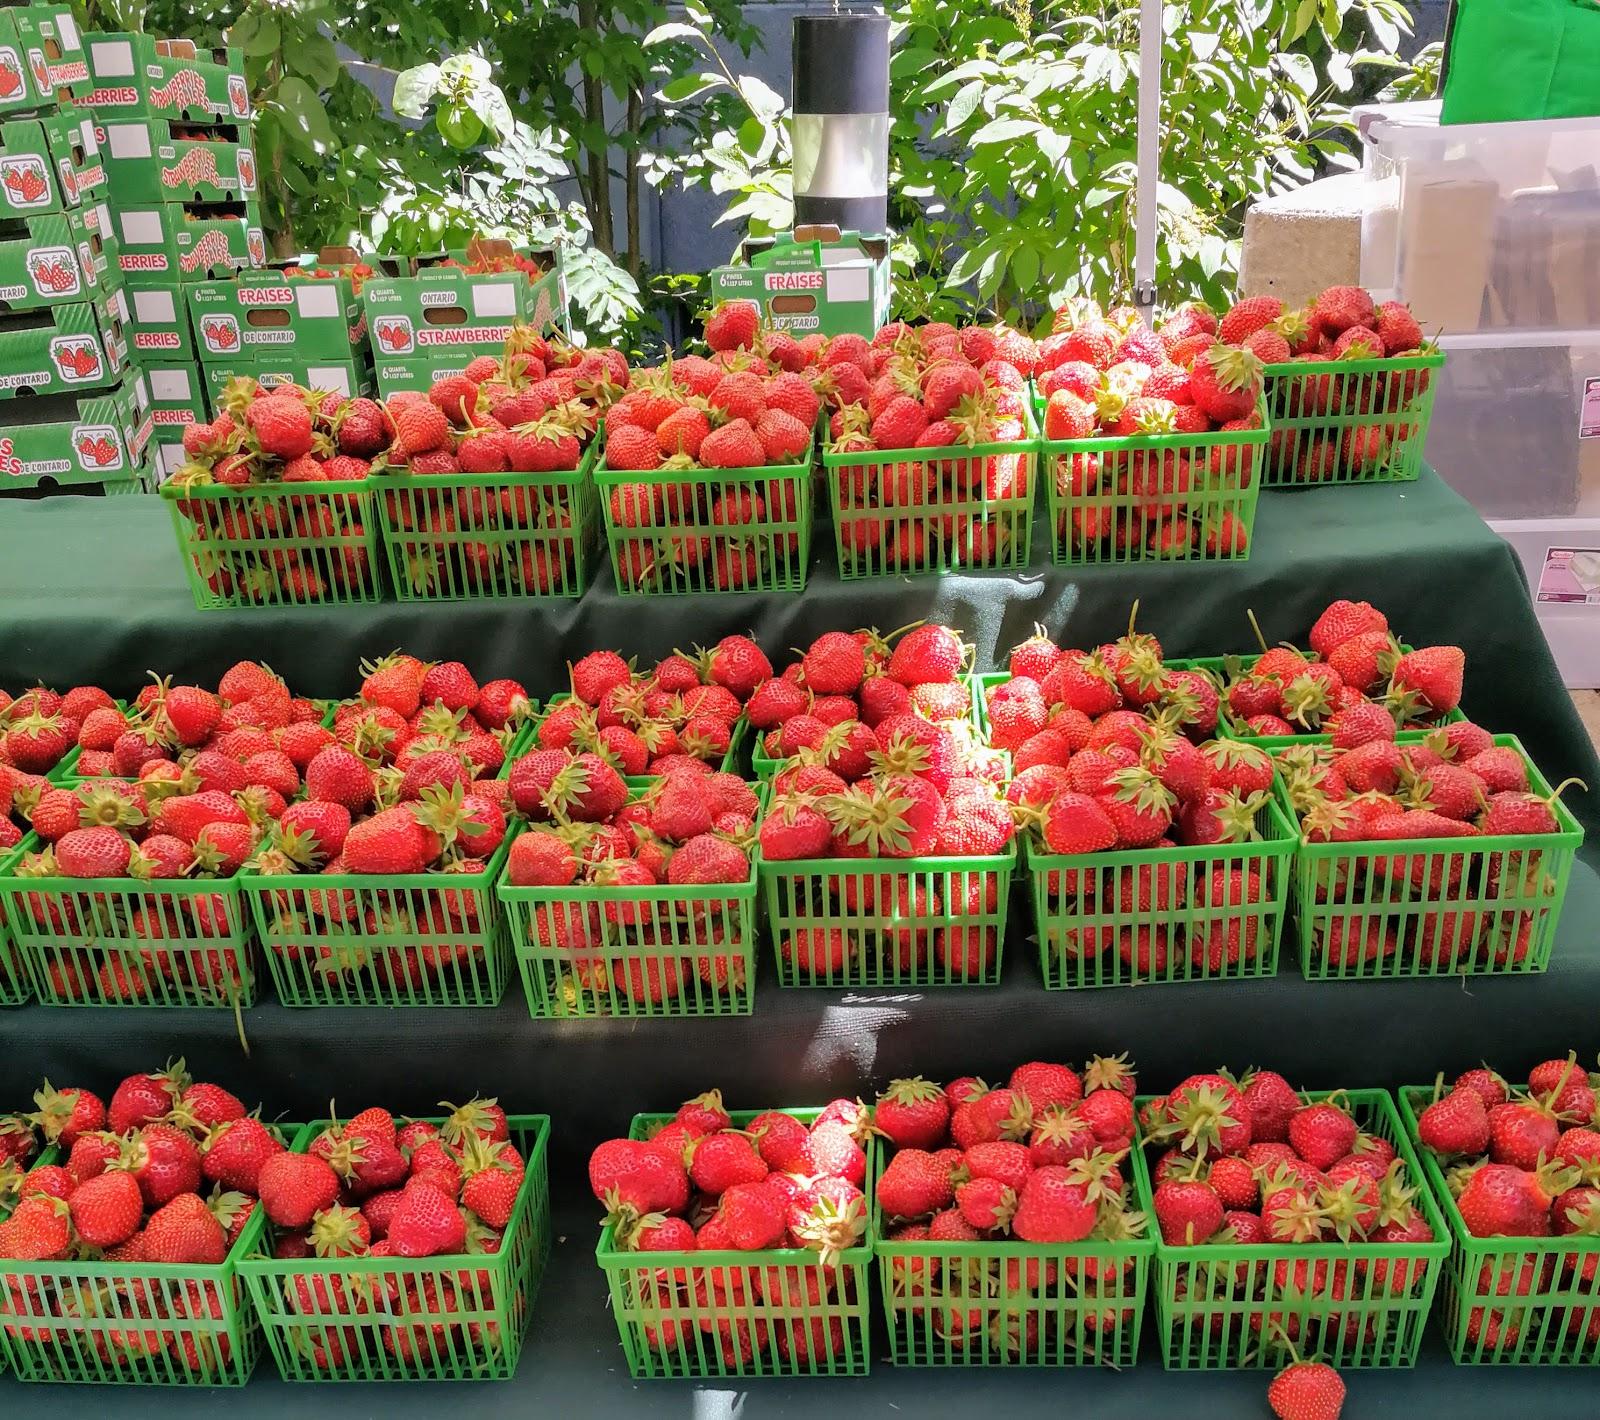 Toronto Farmers Market, fresh strawberries